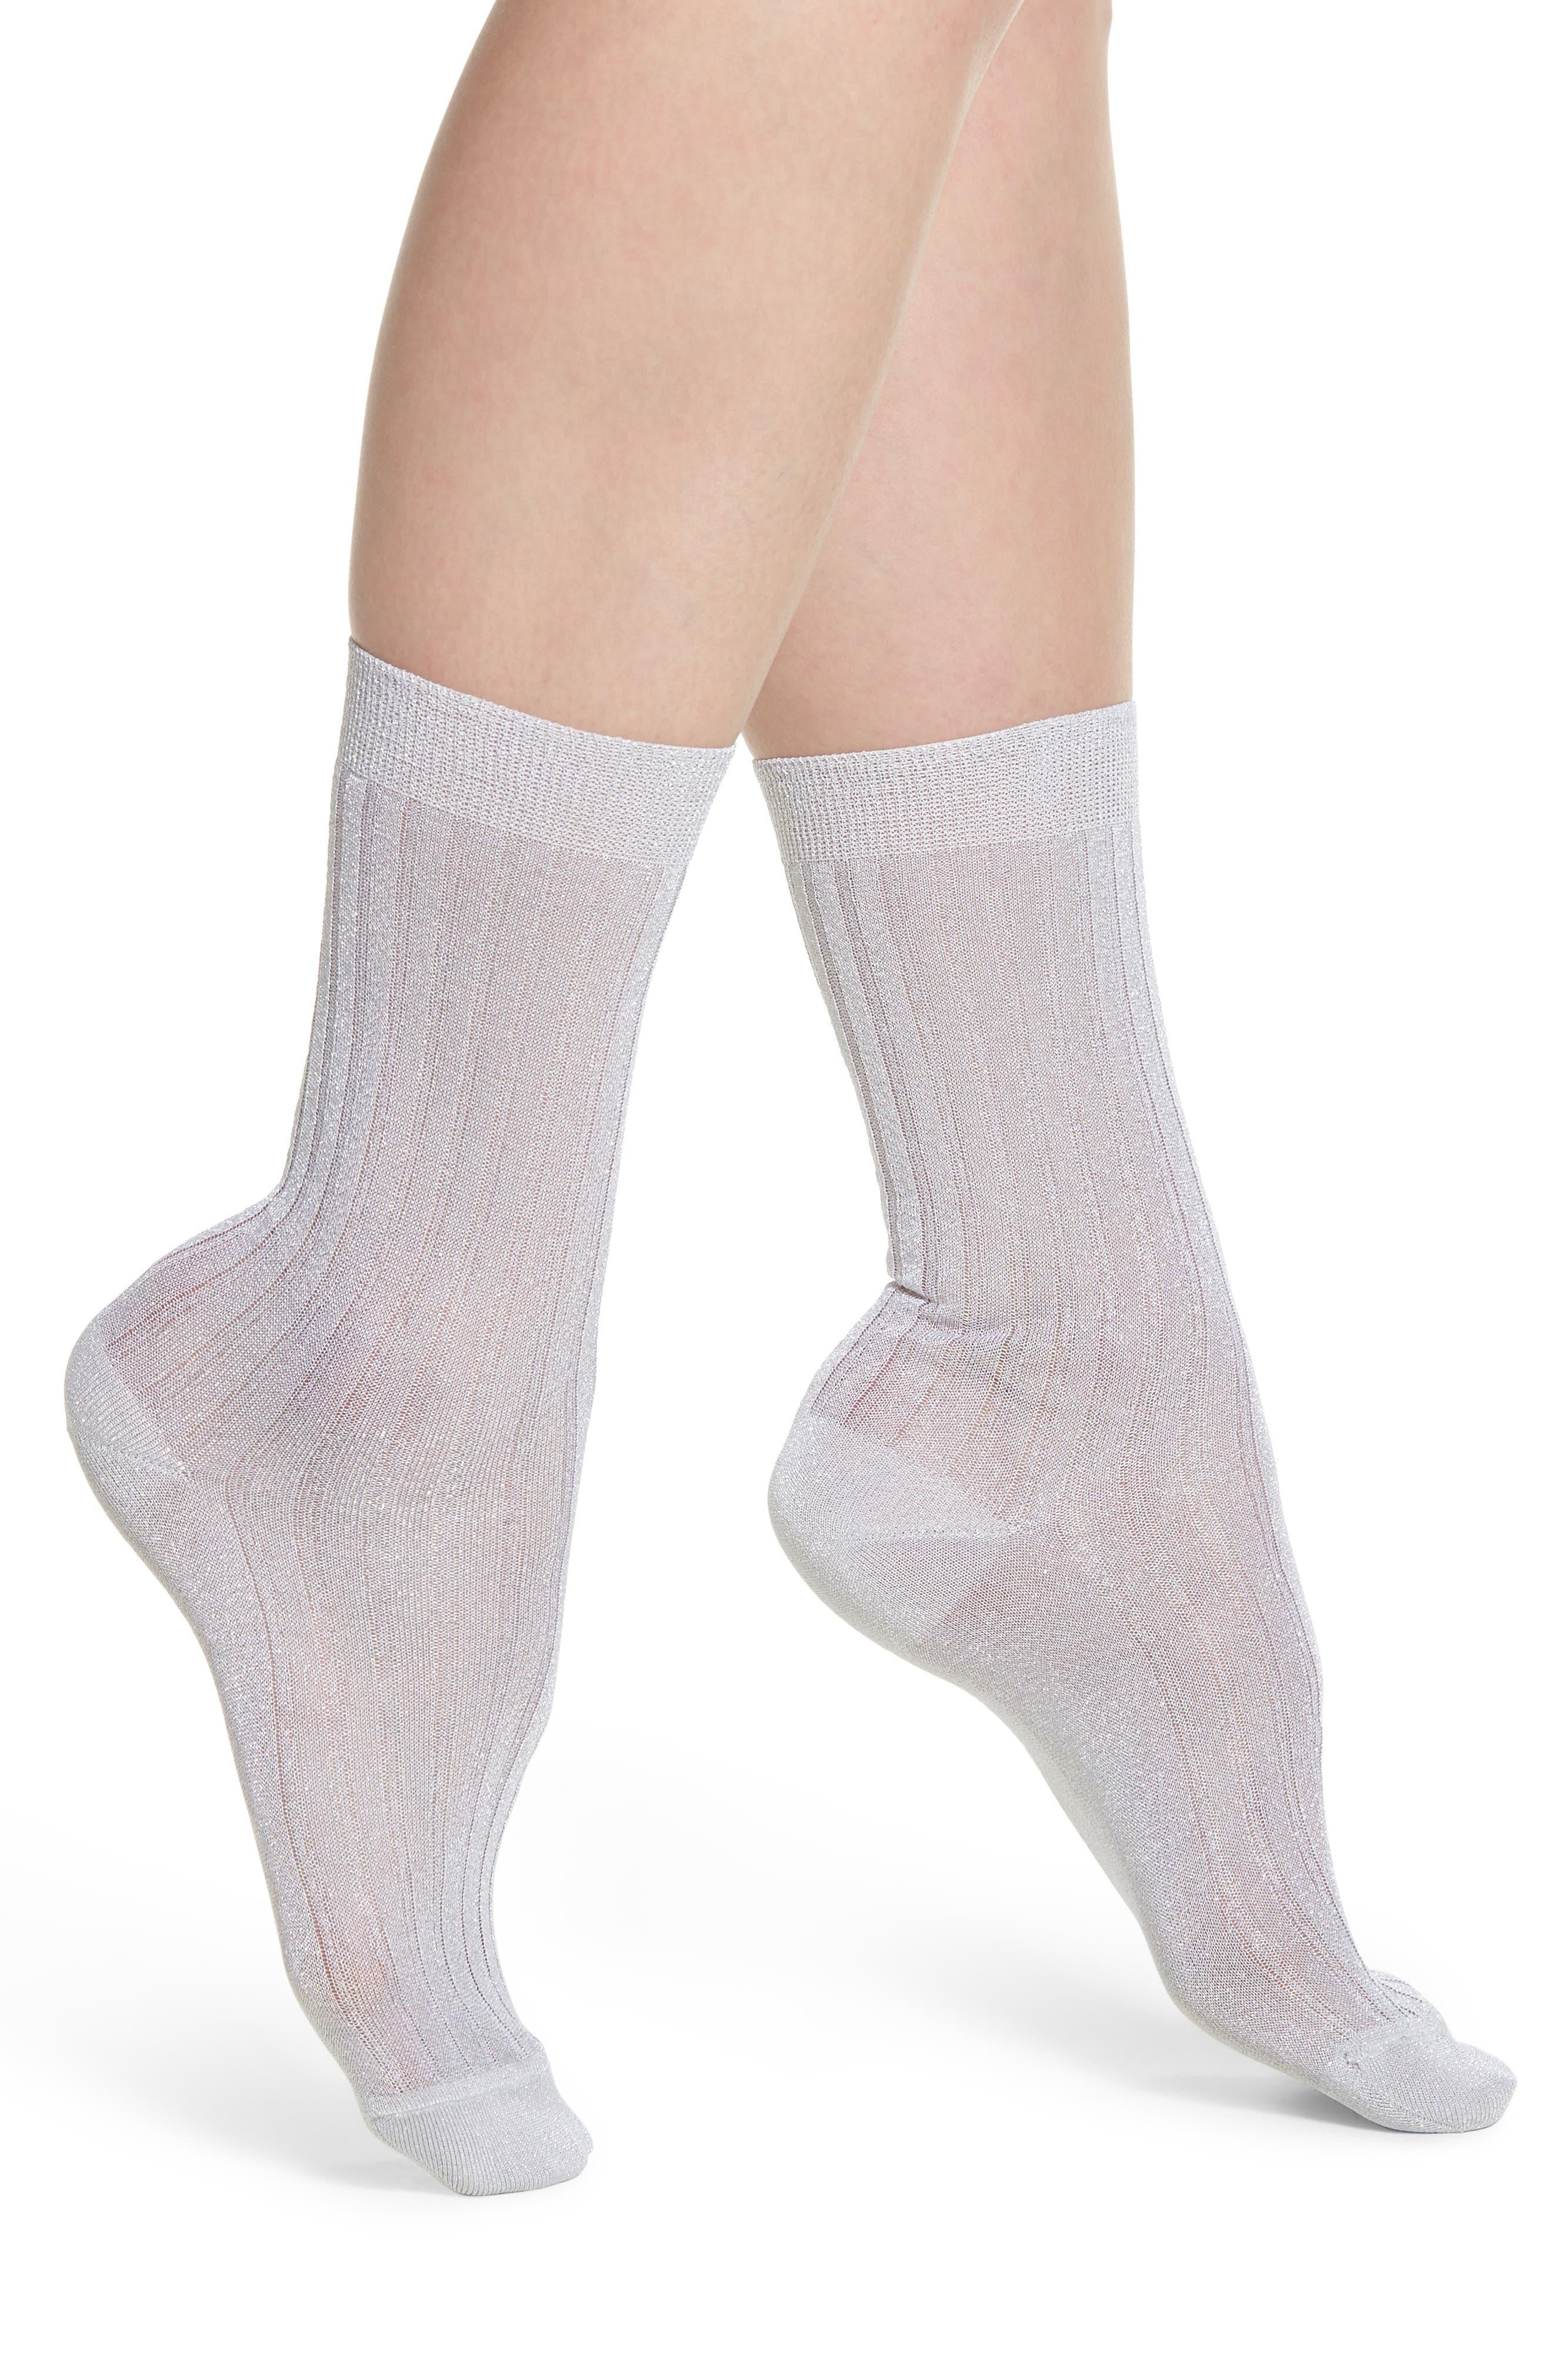 Costina Metallic Ankle Socks,                         Main,                         color, 040